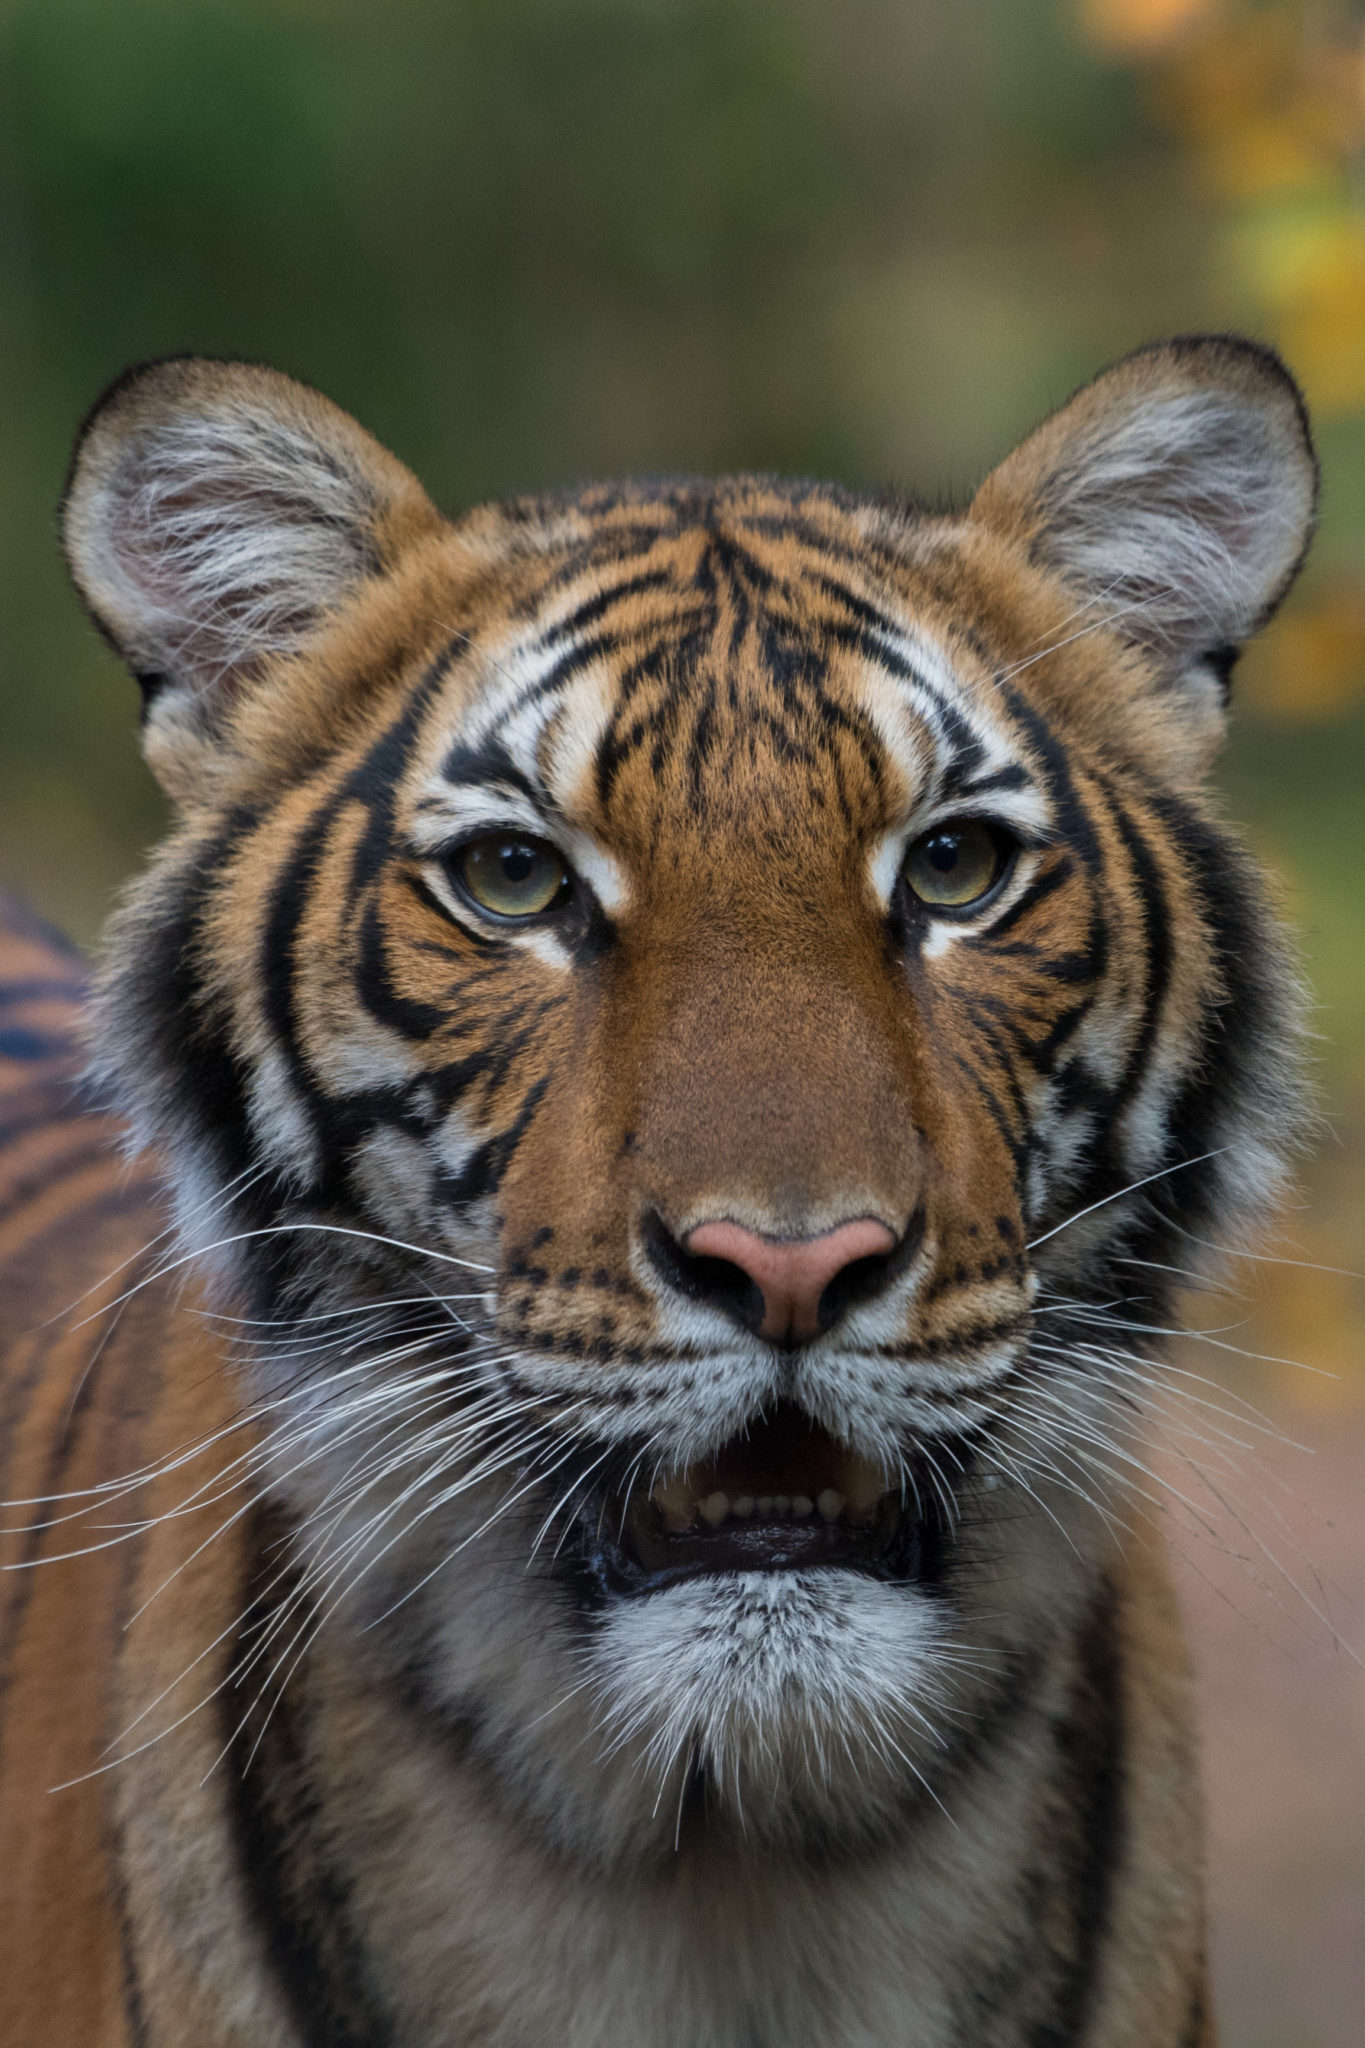 Tigre con coronavirus. Un tigre malayo. Imagen de Julie Larsen Maher / WCS.